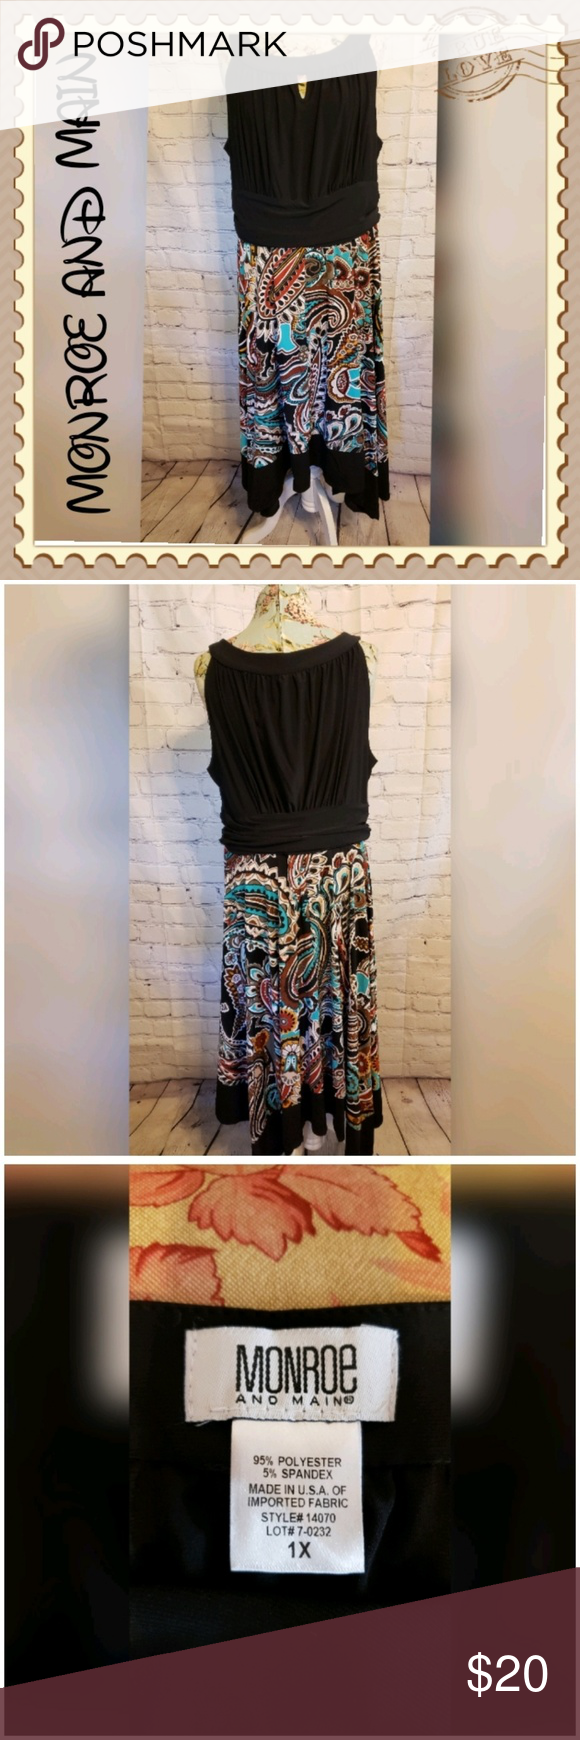 Monroe & Main Black Multi Colored Sleeveless Dress #blacksleevelessdress